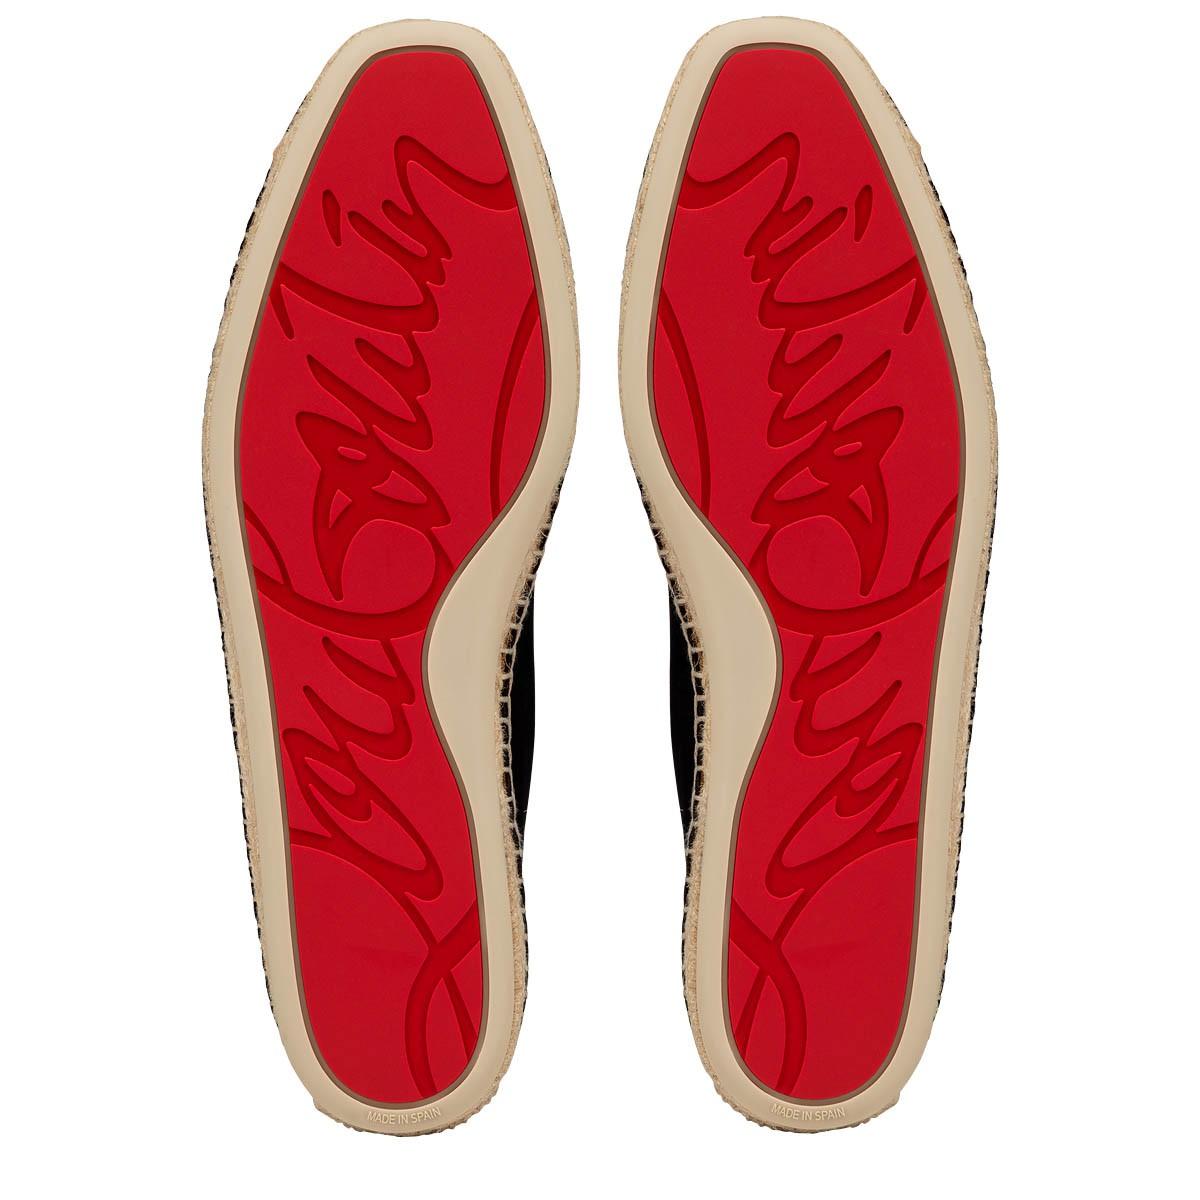 best service 77f4d 08e2f Nanou Orlato Flat Black Leather - Men Shoes - Christian Louboutin